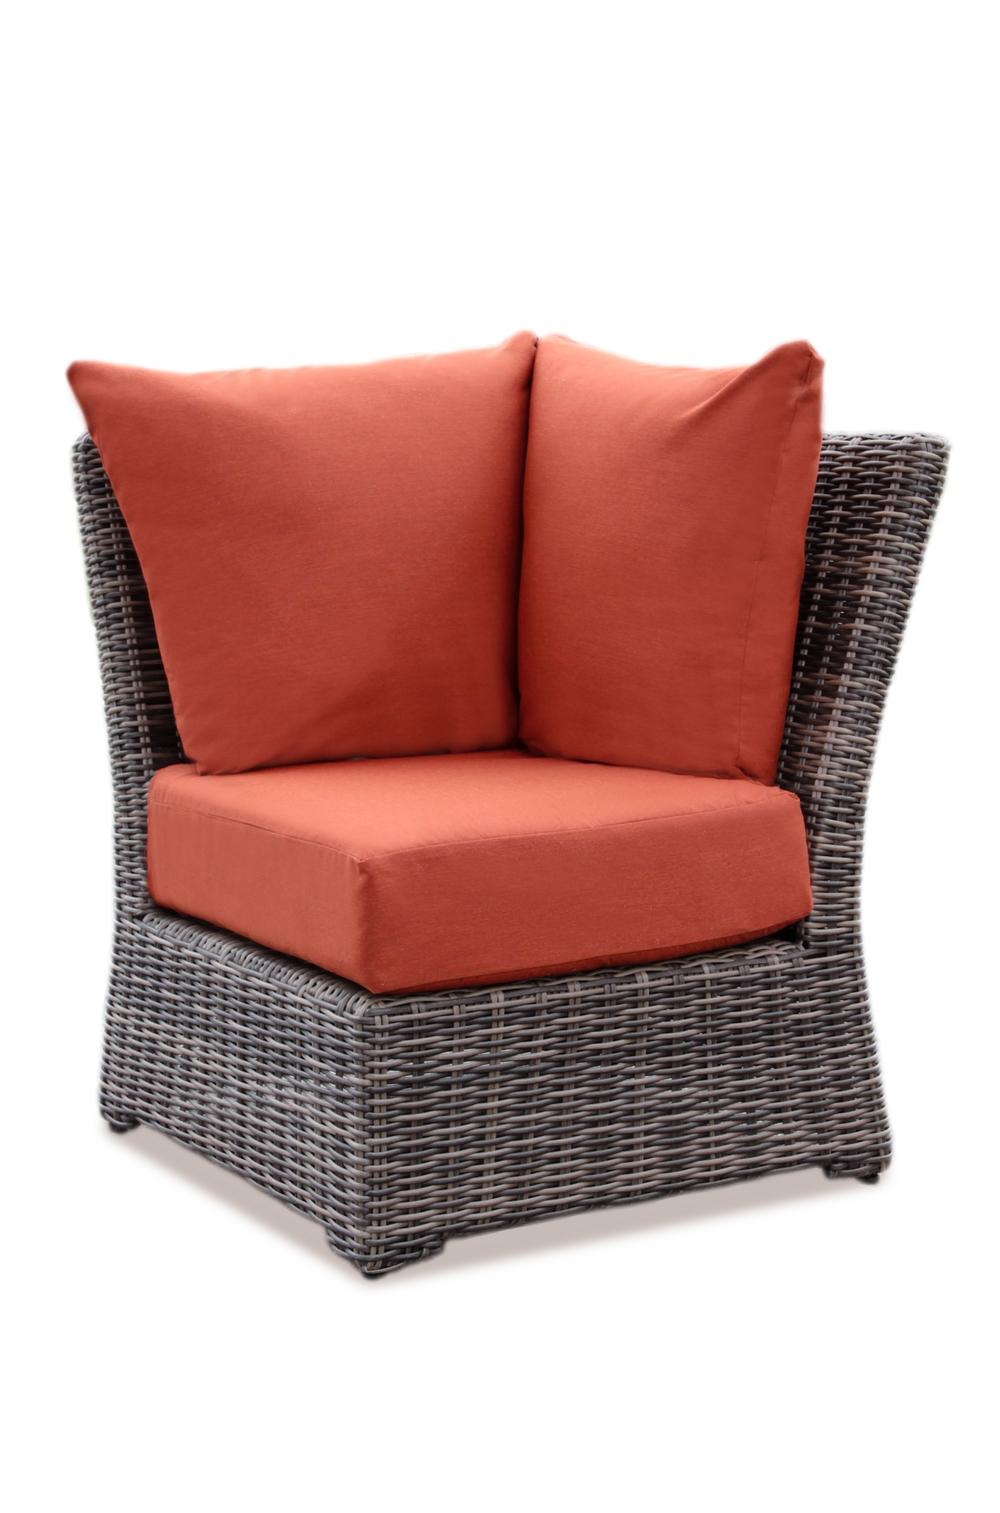 AE Outdoor Cherry Hill Outdoor Patio Furniture Modular Corner Brick ...